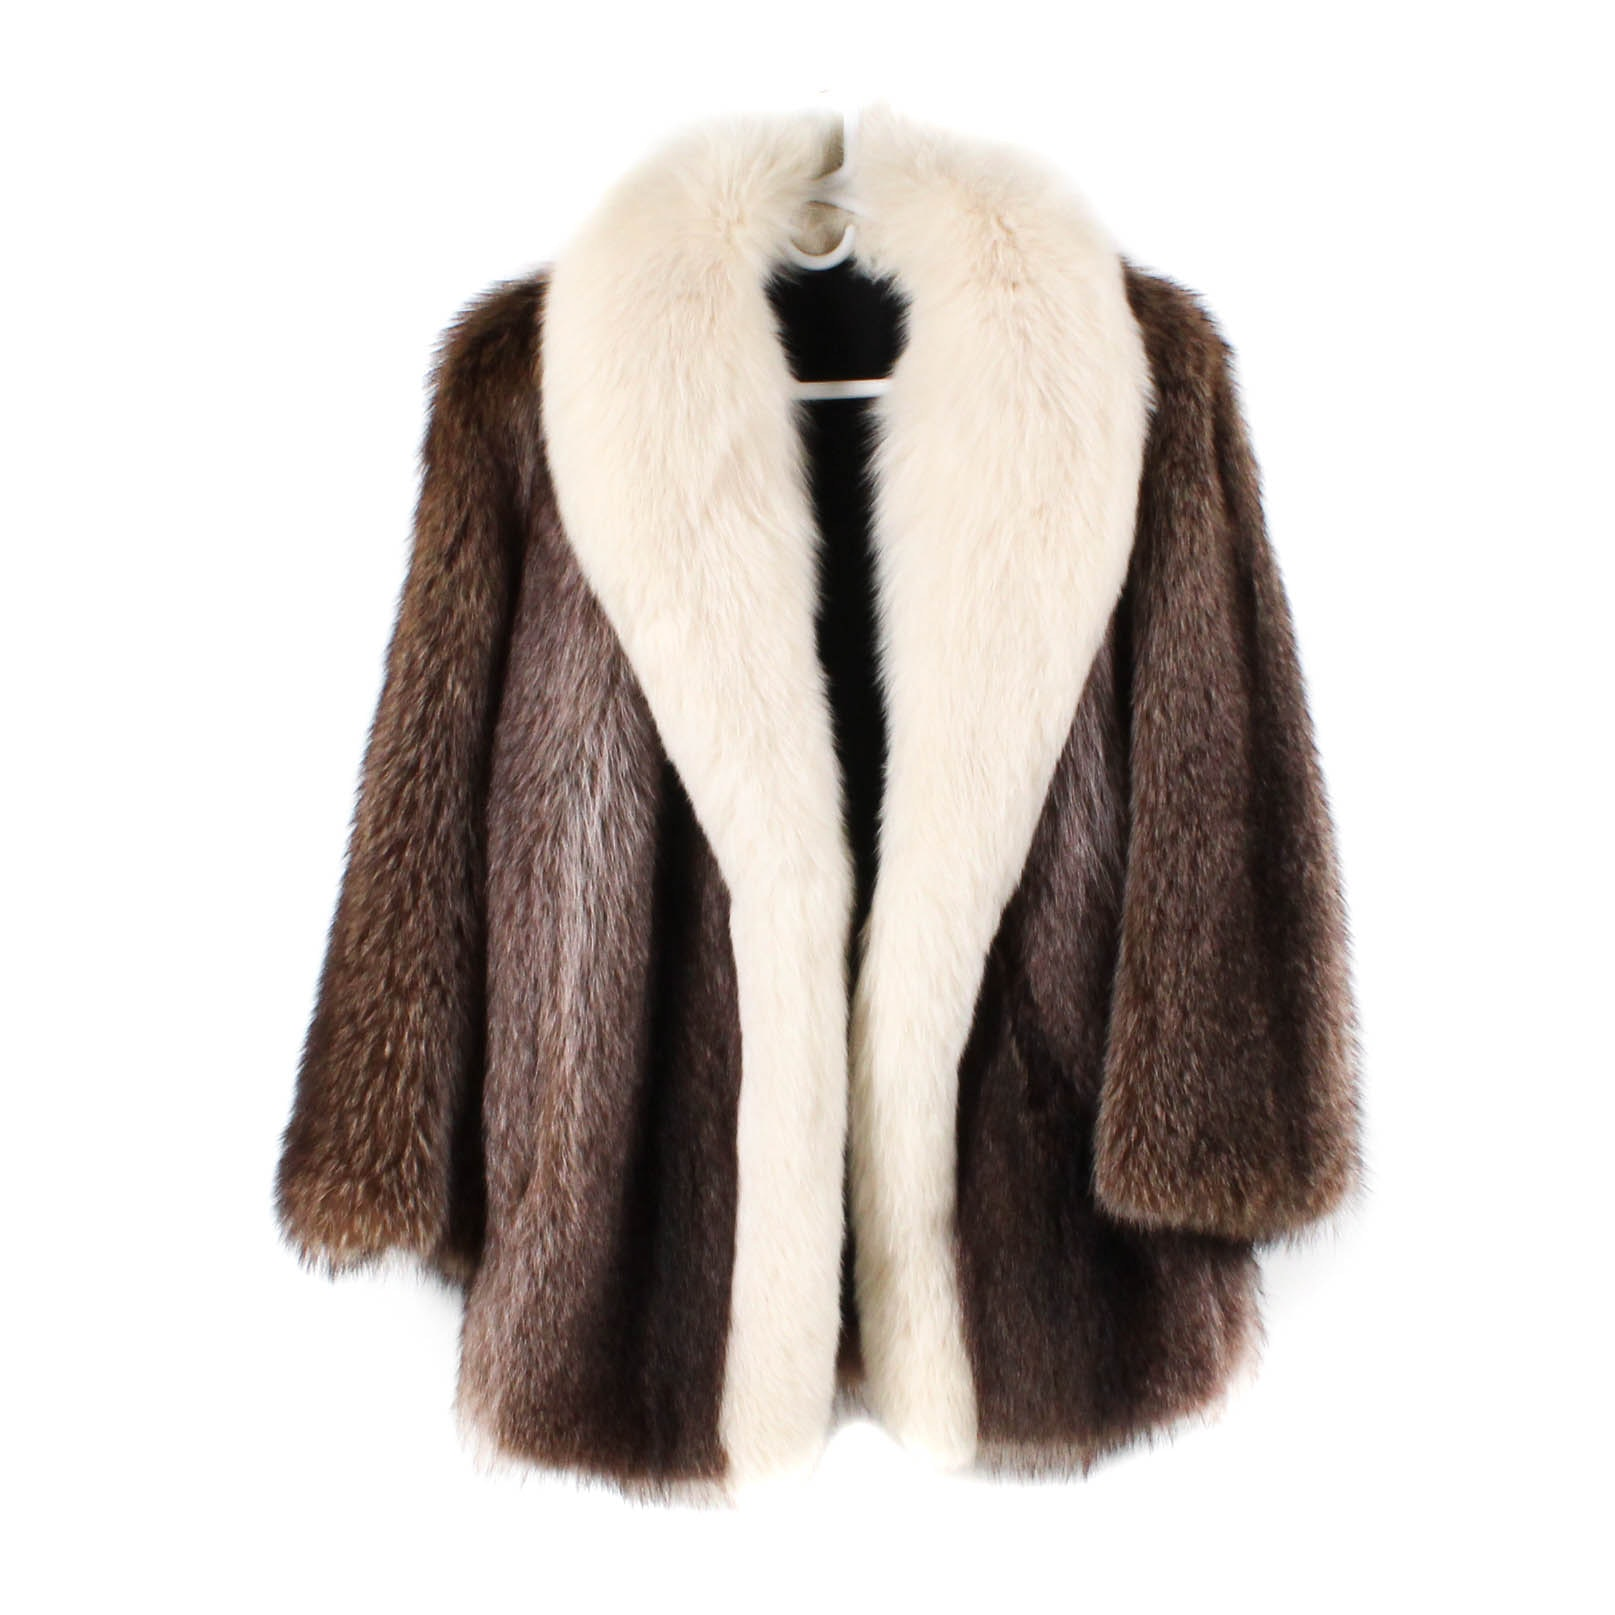 Raccoon Fur Stroller Trimmed in White Fox Fur